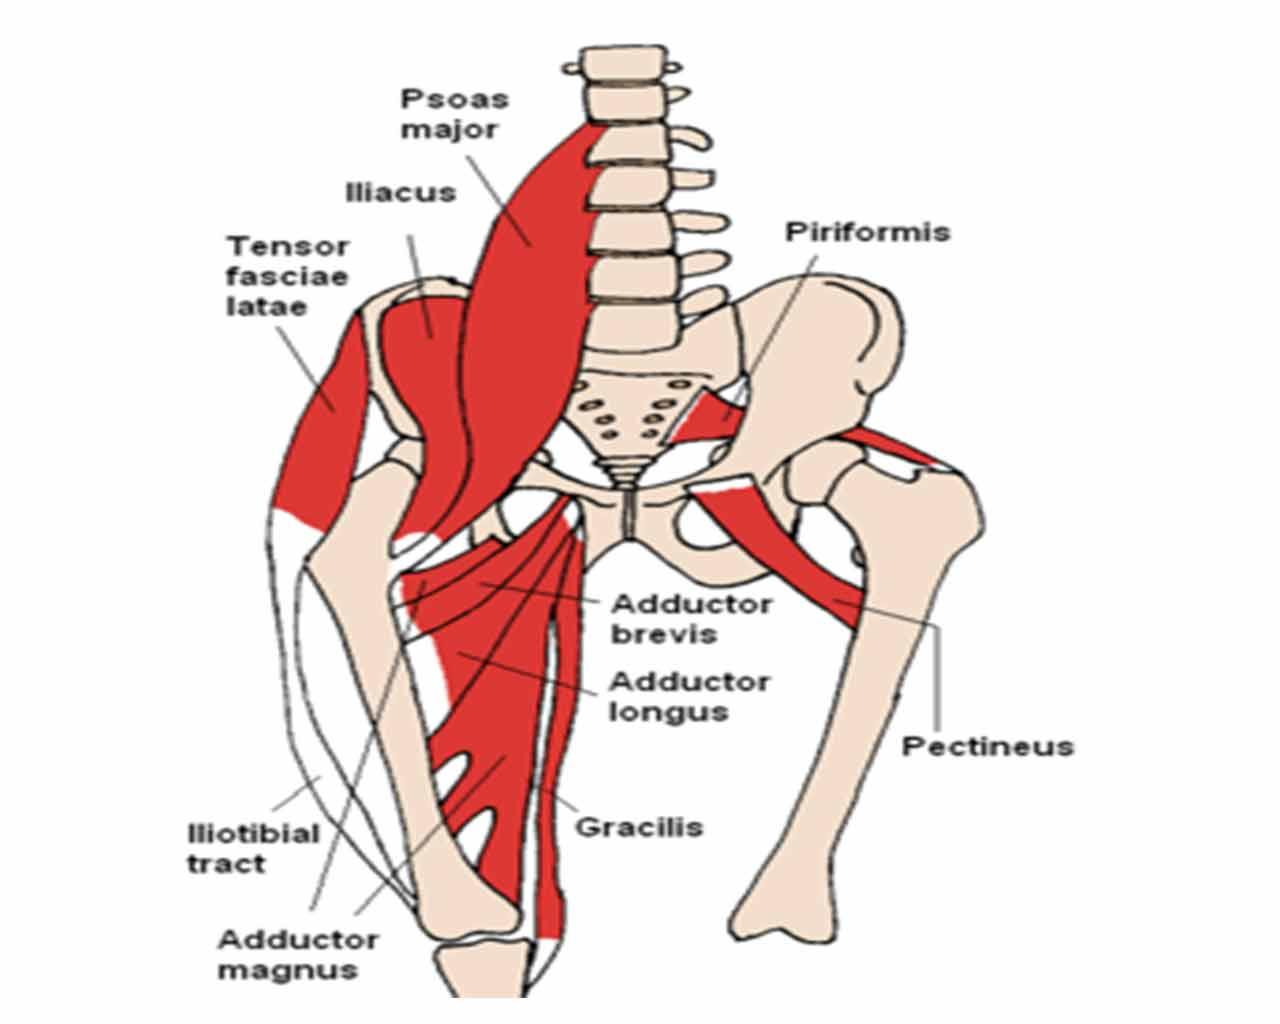 Muscolo iliaco e psoas